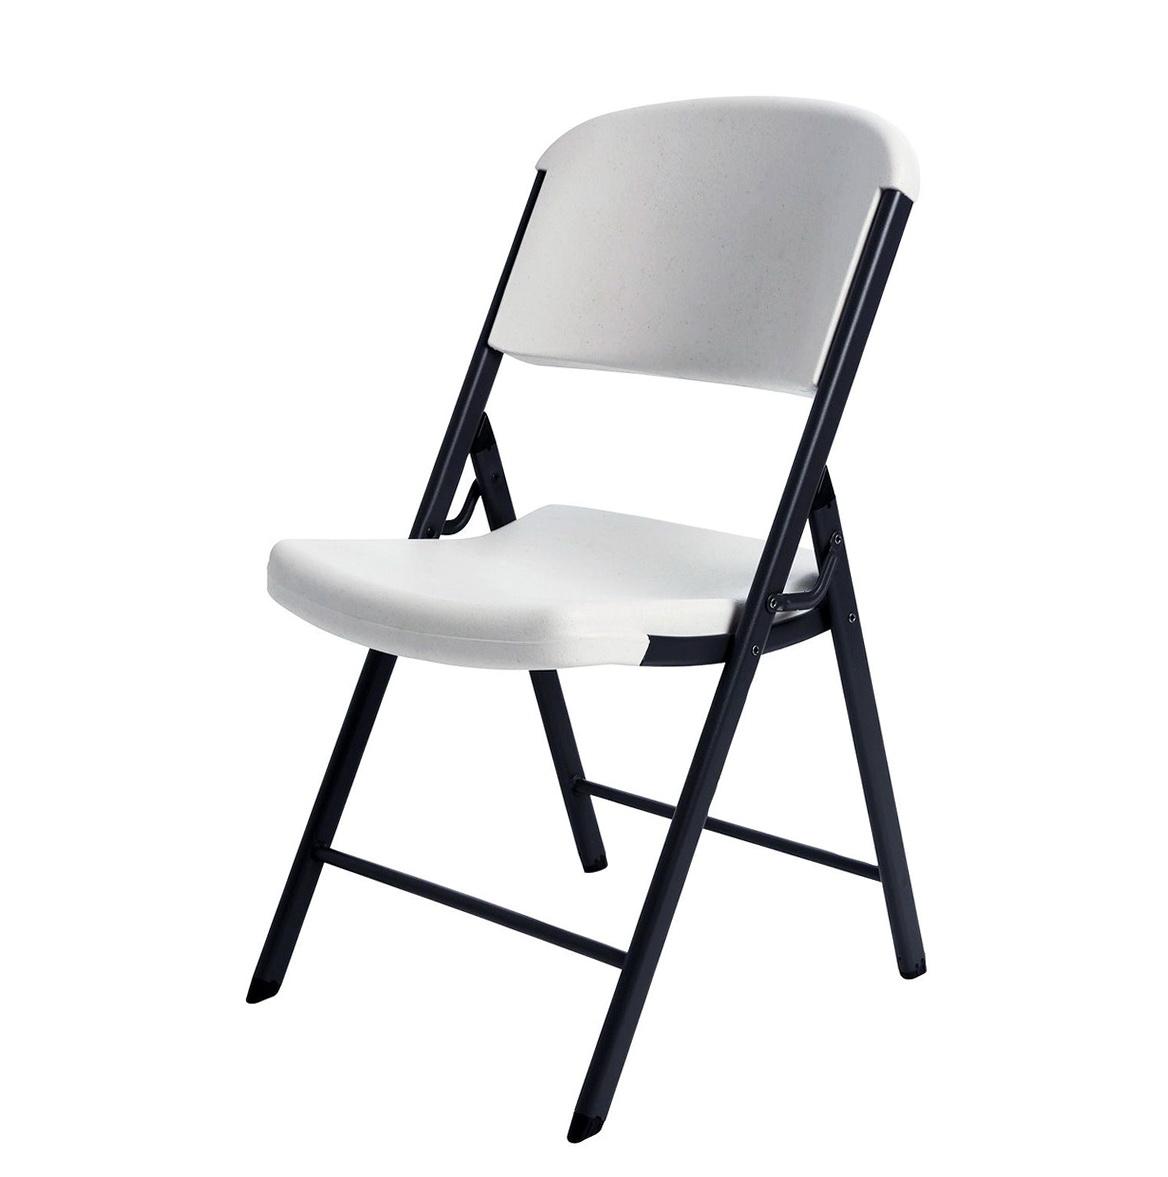 White Folding Chairs Costco